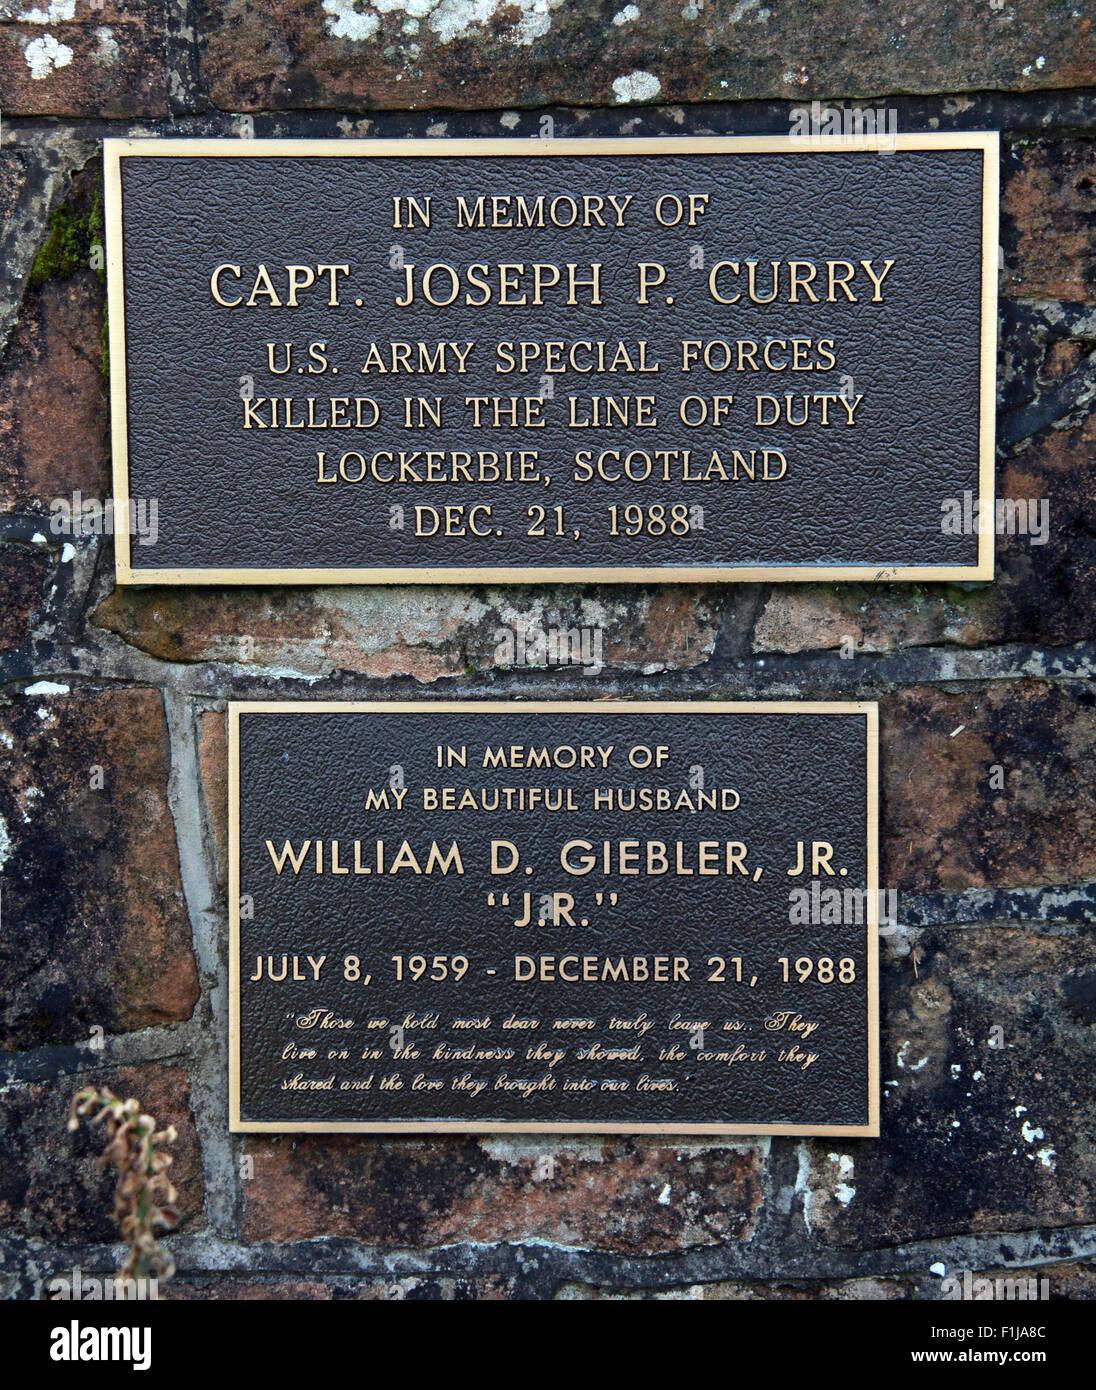 Lockerbie PanAm103 In Rememberance Memorial Capt Joseph P. Curry US Army Special Forces William D. Giebler JR Stock Photo